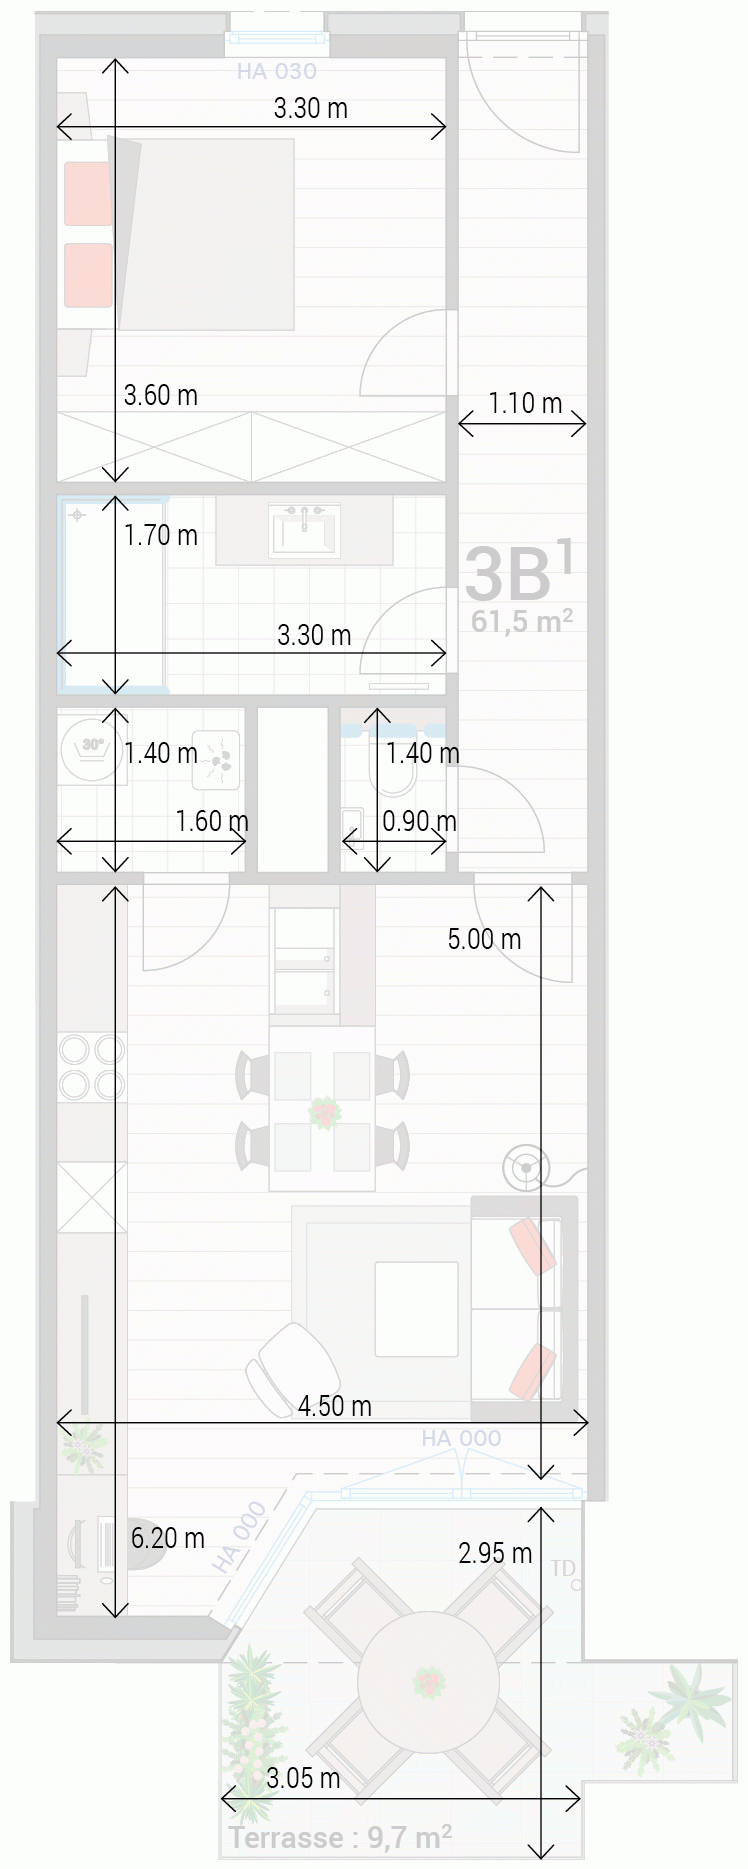 Wohnung 3B